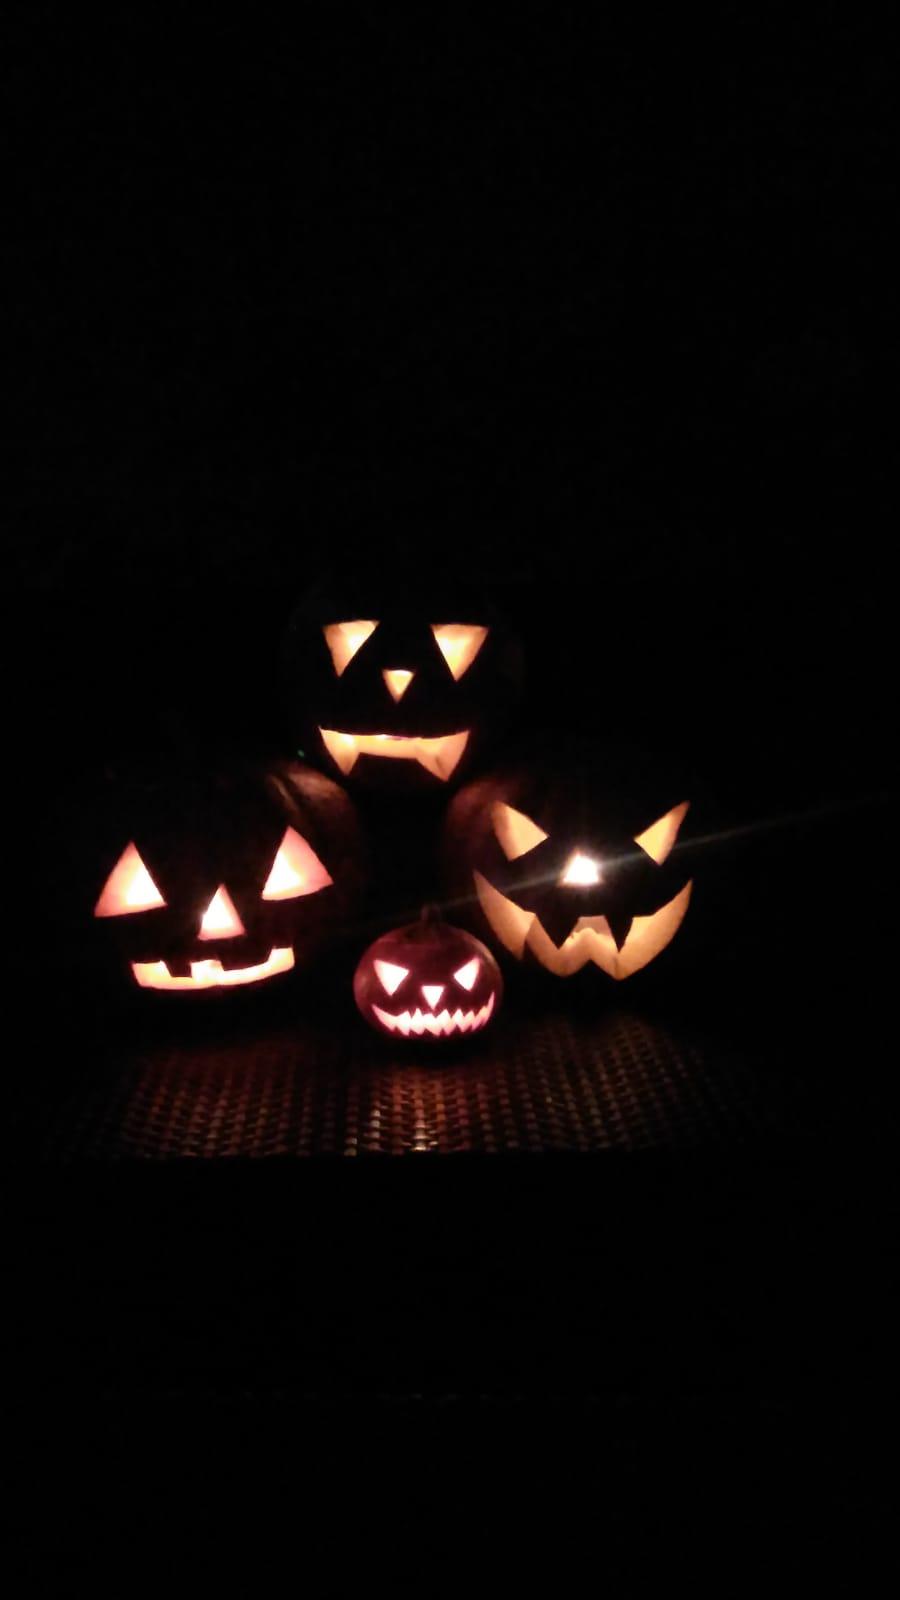 Images/halloween_2020/89f90e64-33c7-4cda-8352-d23e483f7b69.jpg